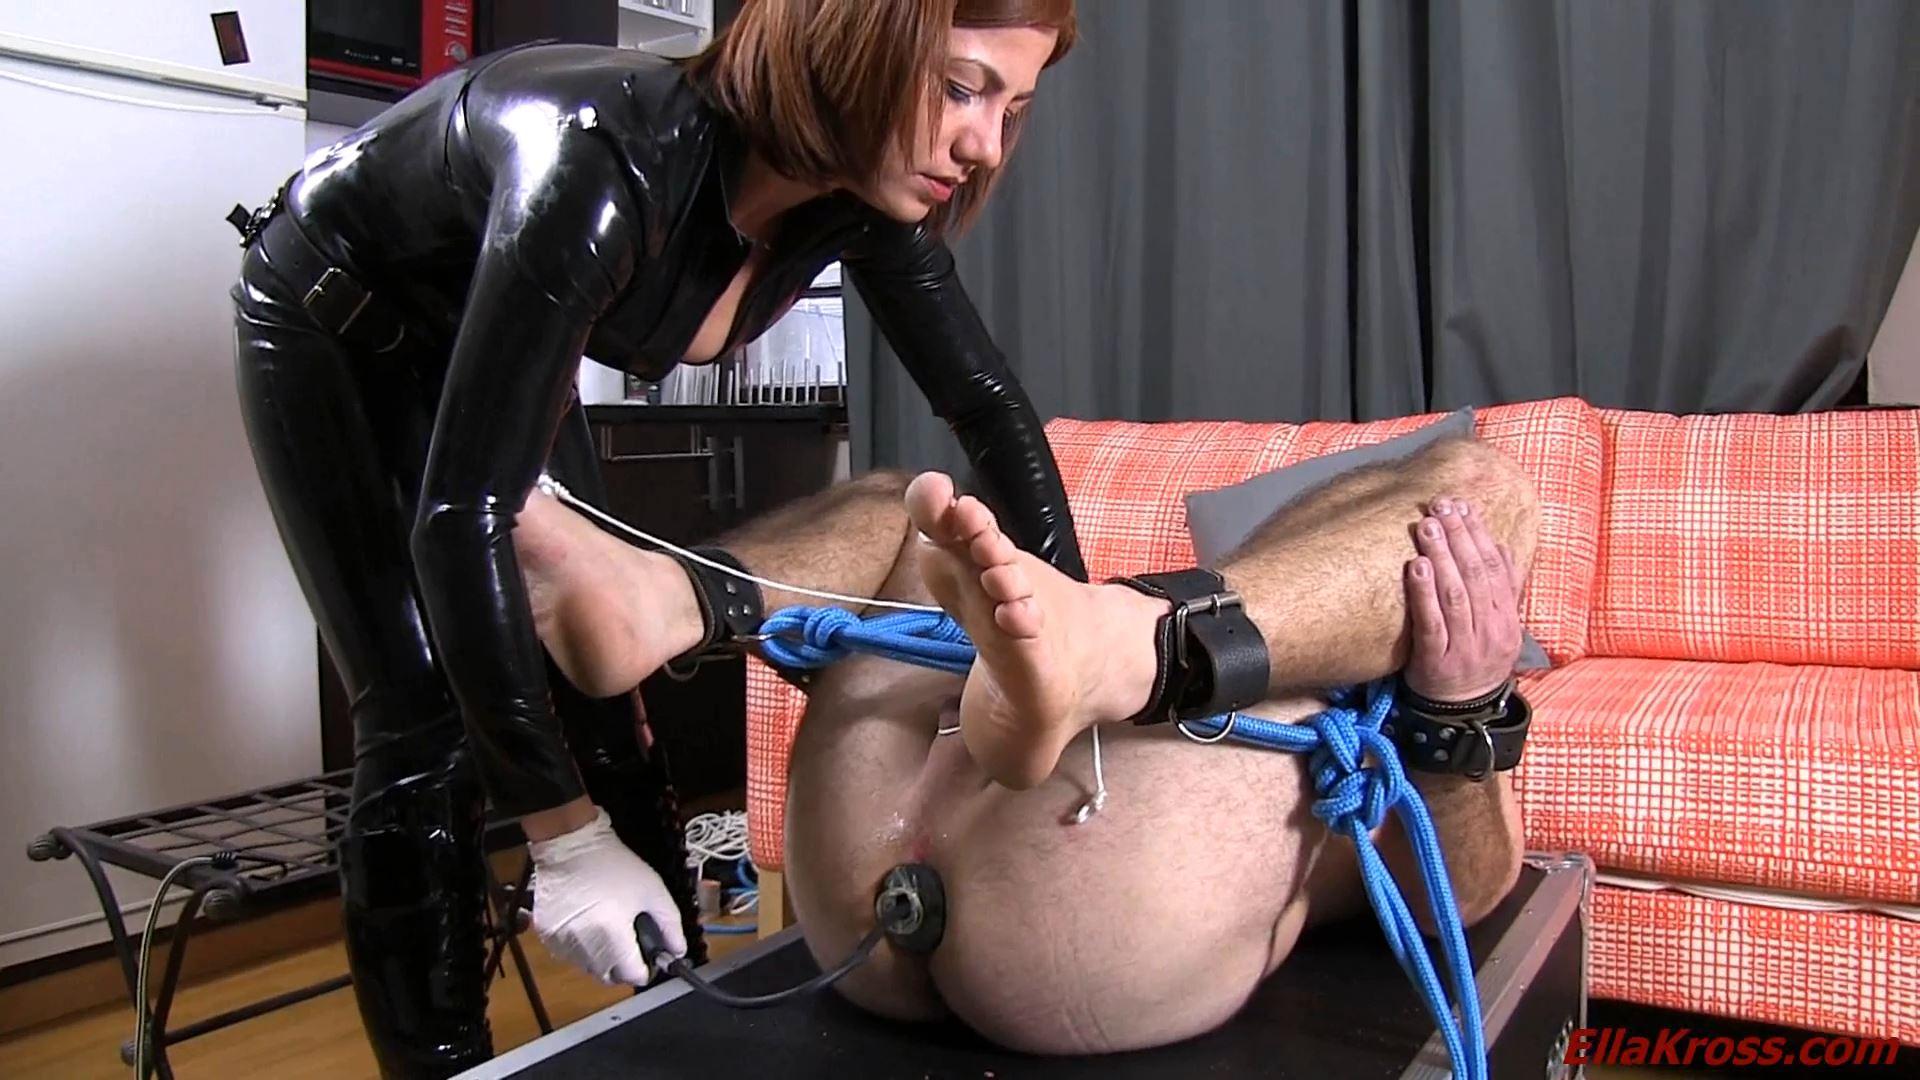 Ella Kross In Scene: Torturing My Slave's Feet, Asshole, and Mouth - ELLAKROSS - FULL HD/1080p/MP4